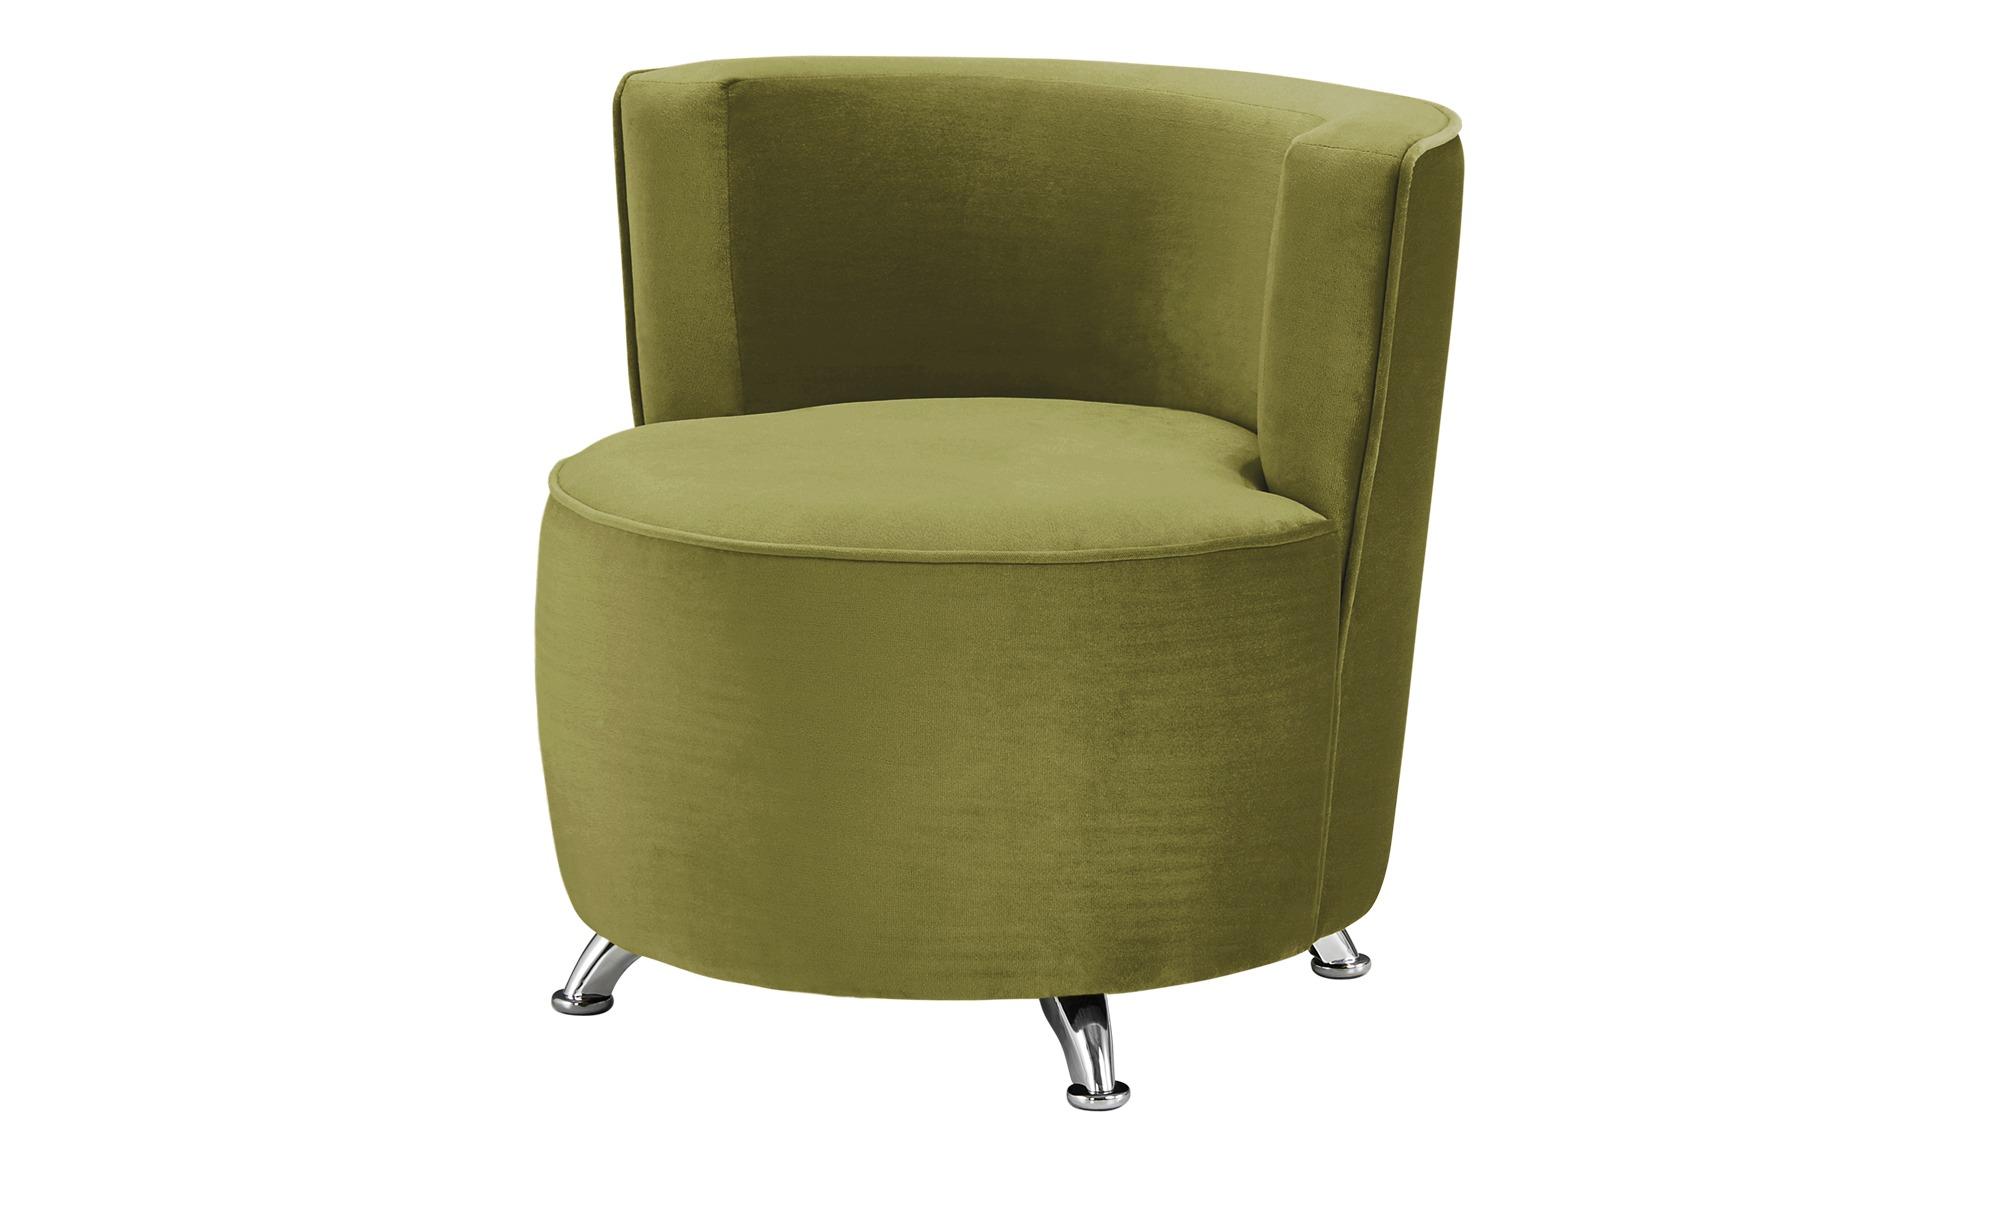 smart Sessel grün - Stoff Baby ¦ grün ¦ Maße (cm): B: 76 H: 71 T: 74 Polstermöbel > Sessel > Polstersessel - Höffner